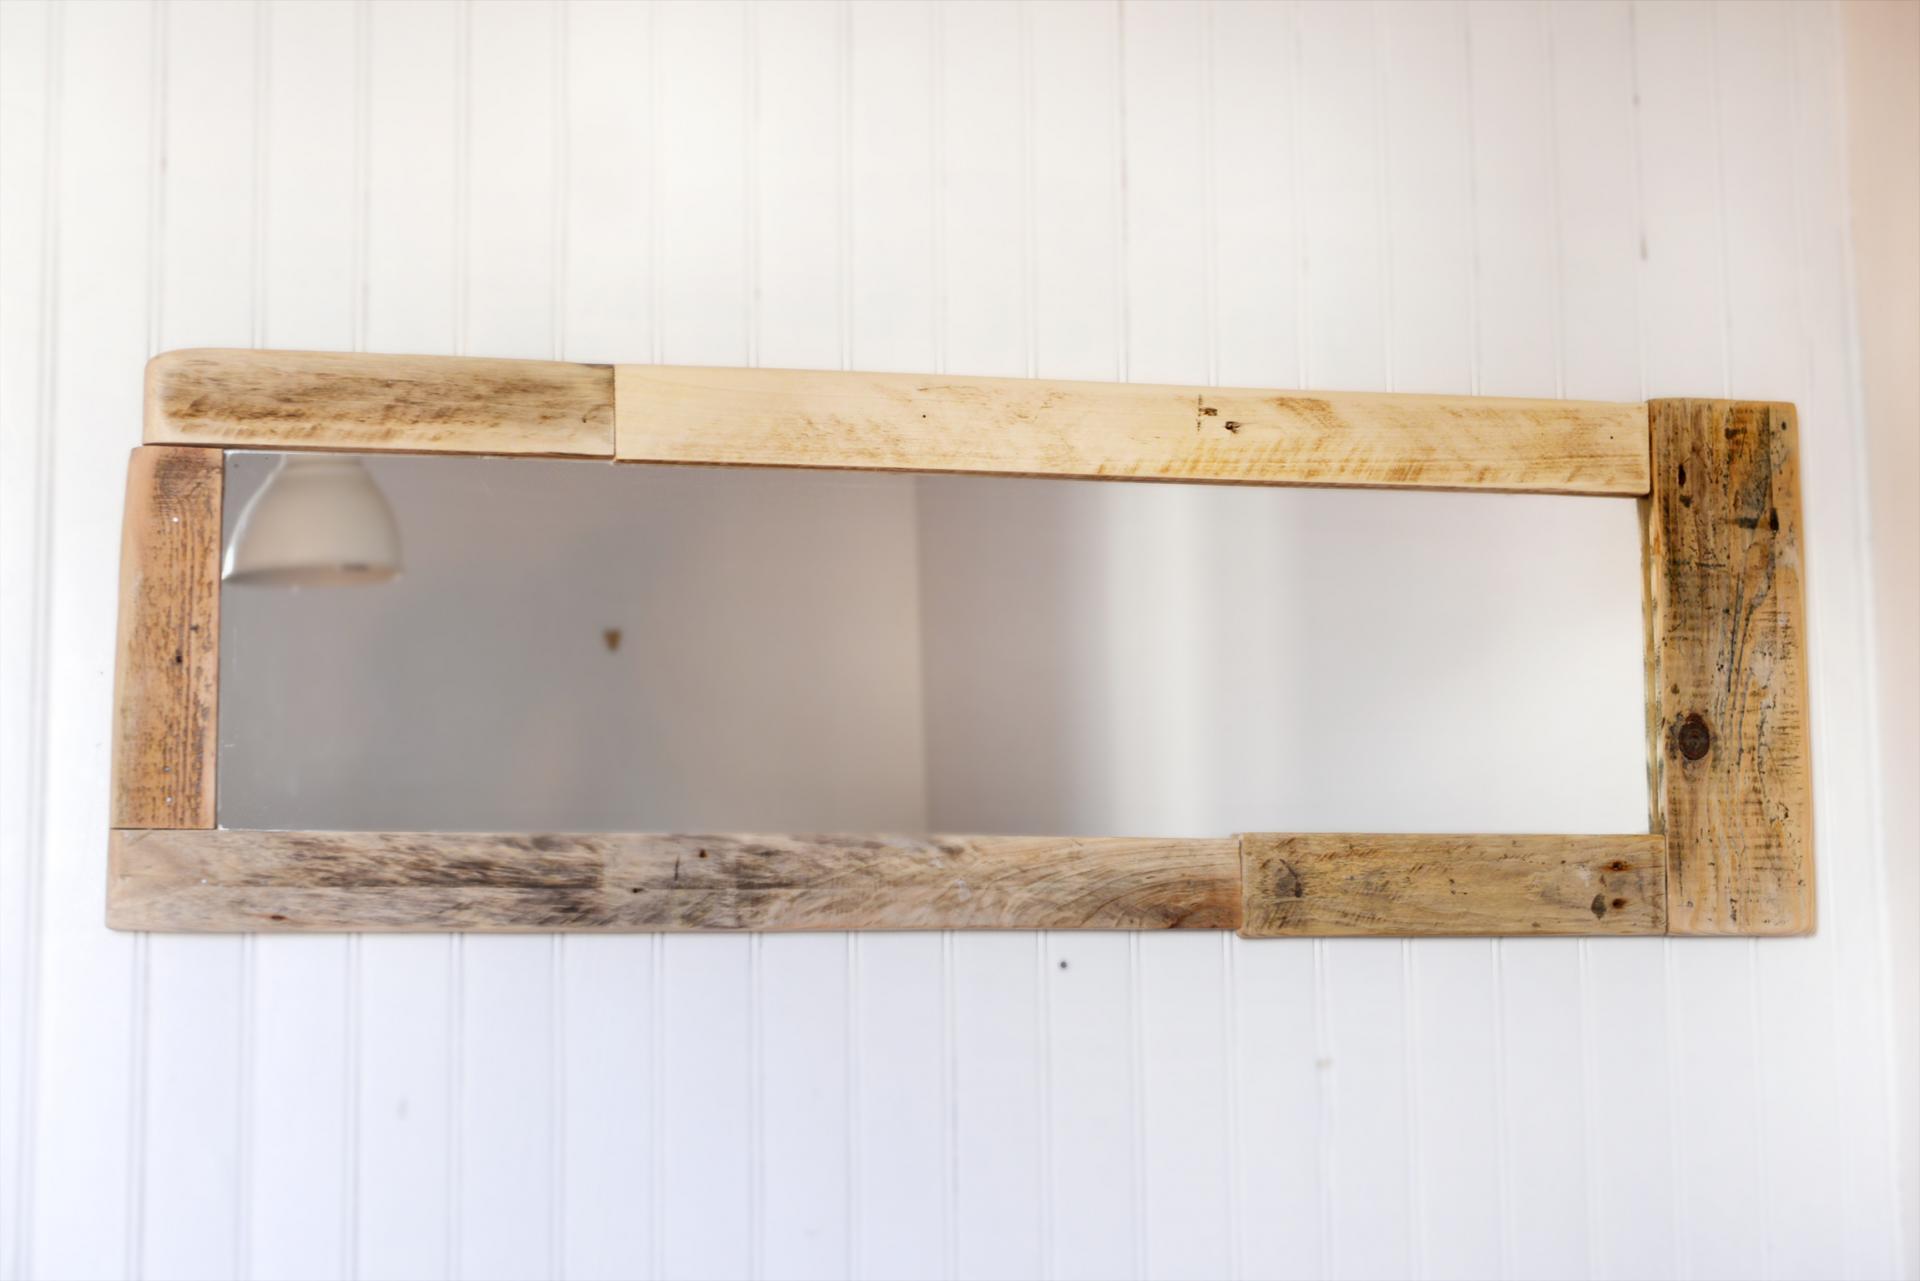 miroir avec cadre bois massif. Black Bedroom Furniture Sets. Home Design Ideas